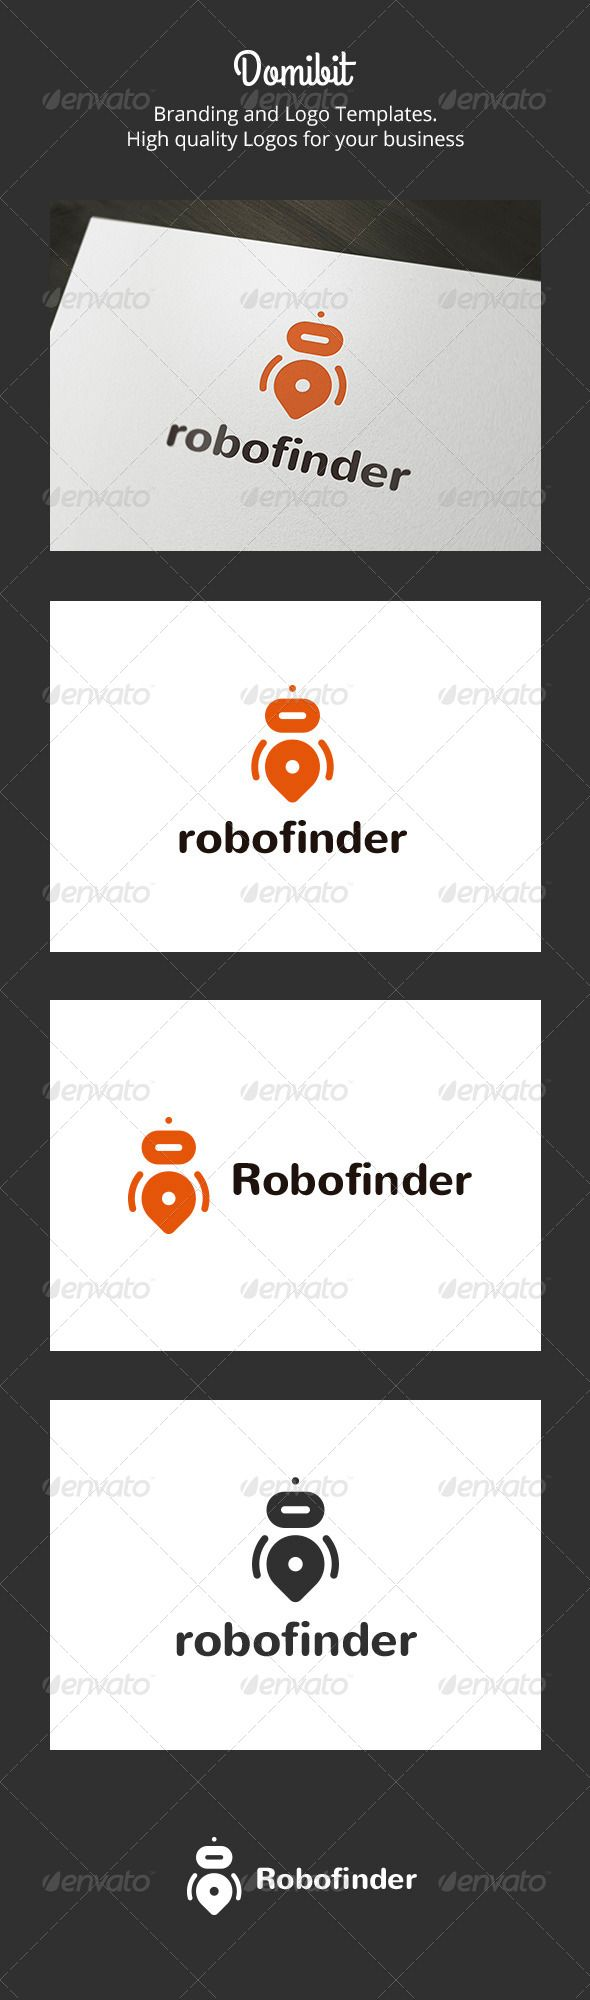 Robofinder Robot Finder  - Logo Design Template Vector #logotype Download it here: http://graphicriver.net/item/robofinder-robot-finder-logo/6160817?s_rank=520?ref=nexion